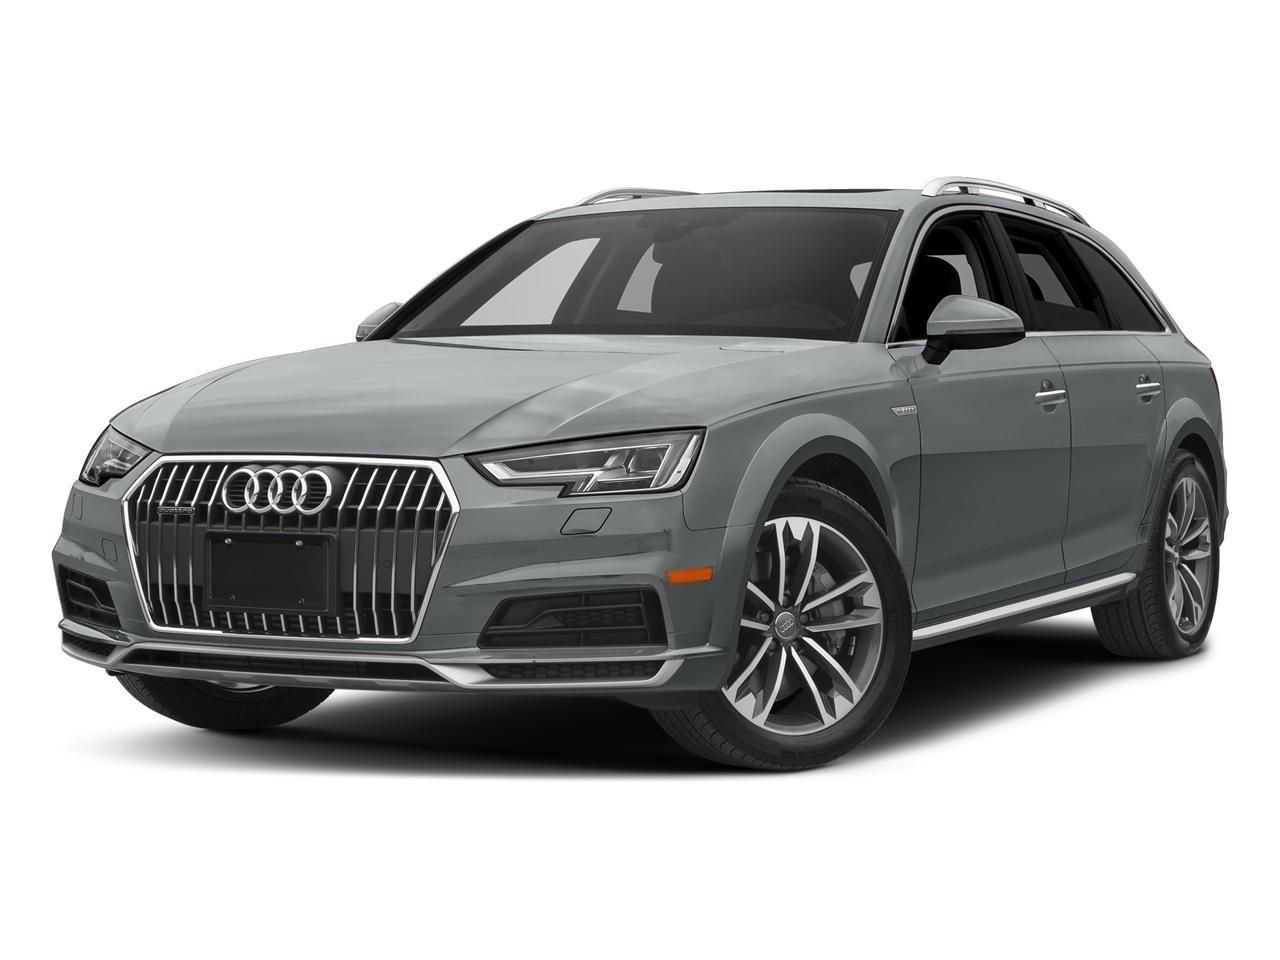 2017 Audi allroad Vehicle Photo in PORTLAND, OR 97225-3518